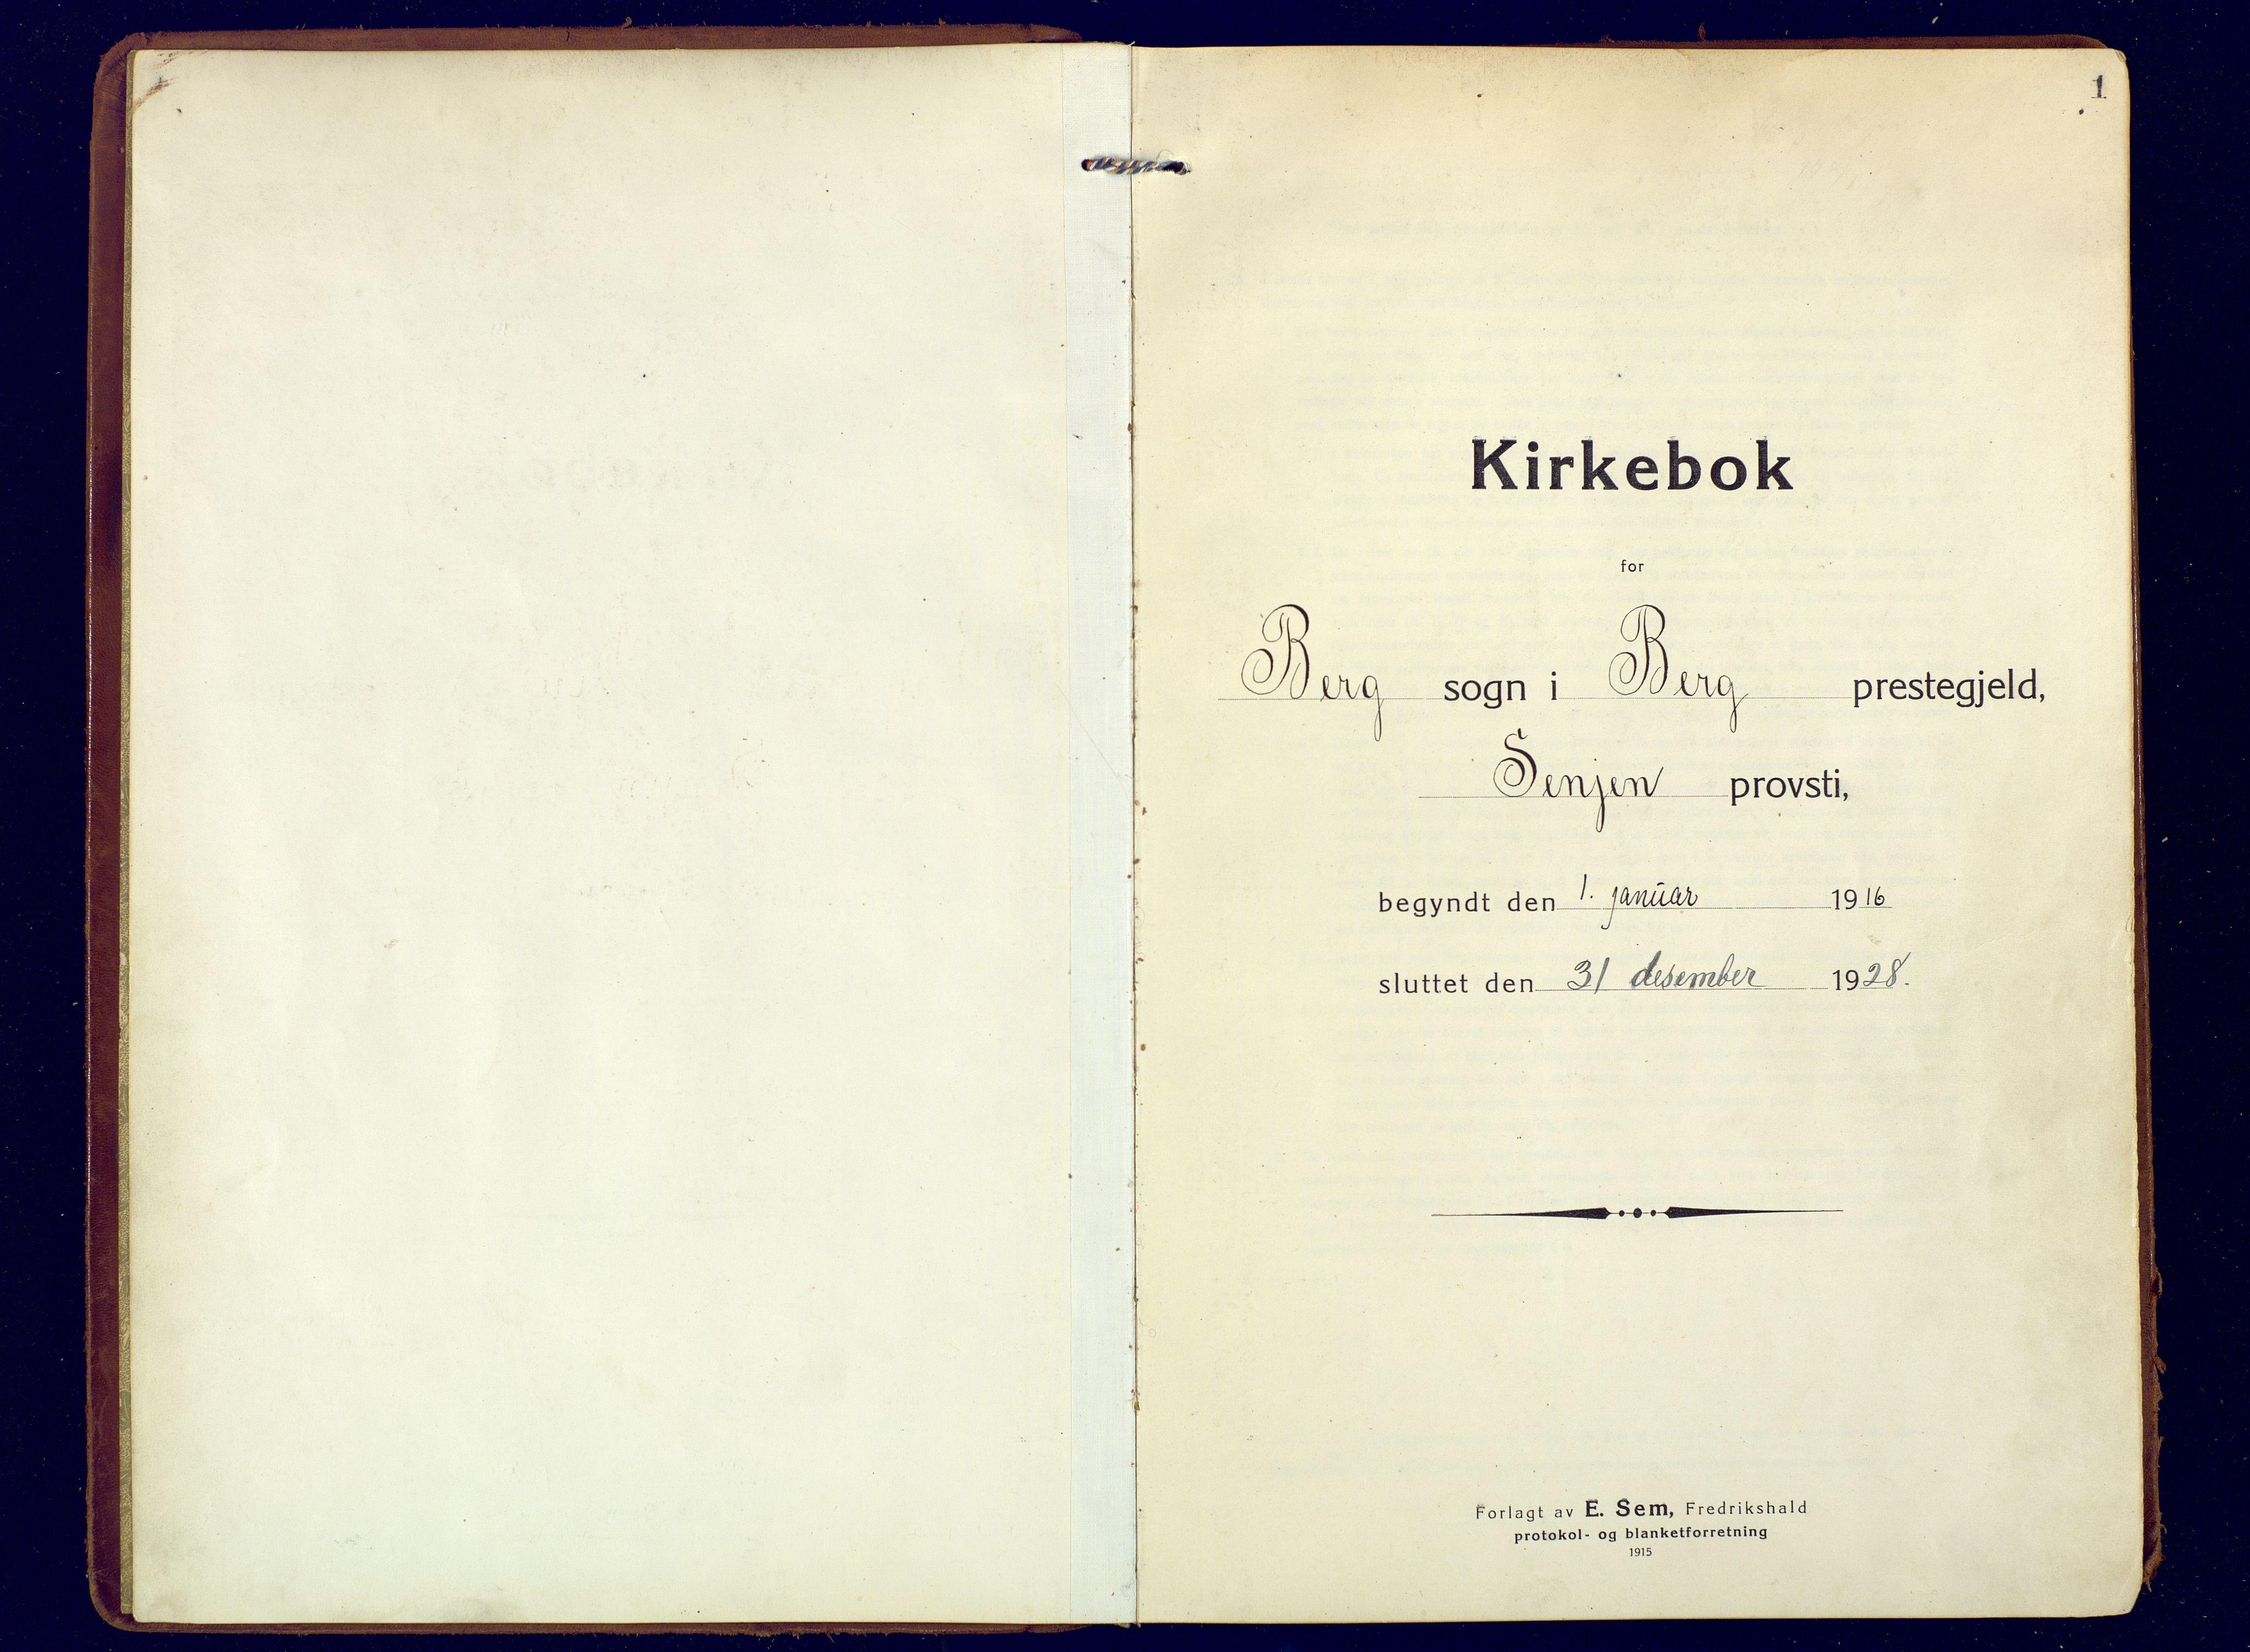 SATØ, Mefjord/Berg sokneprestkontor, G/Ga/Gaa: Ministerialbok nr. 9, 1916-1928, s. 1